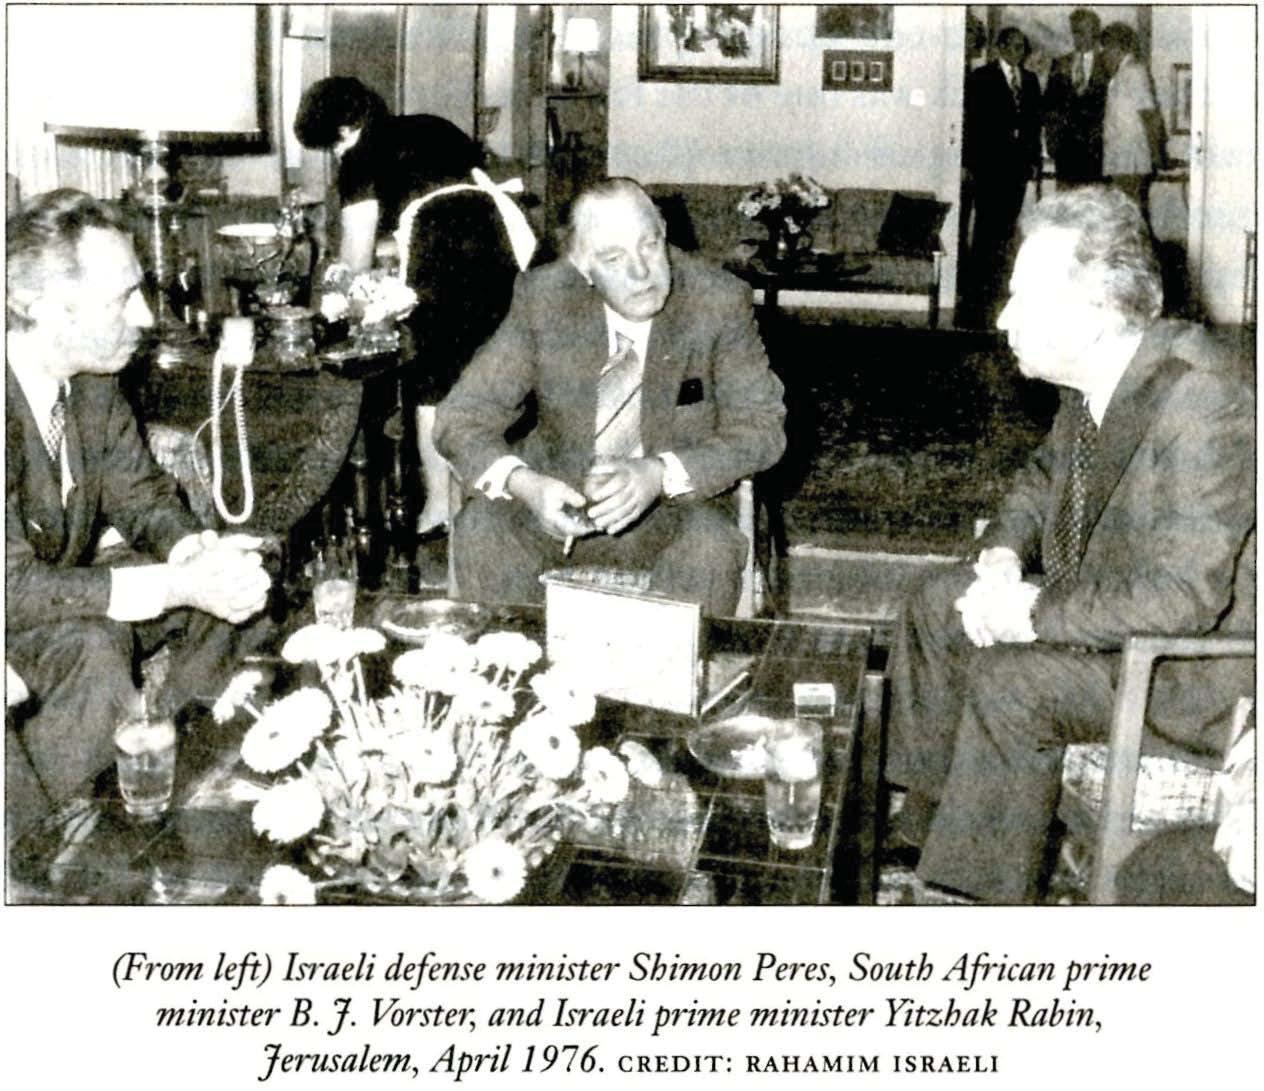 Israeli Diplomats in South Africa (1964) on Boycott: Shades